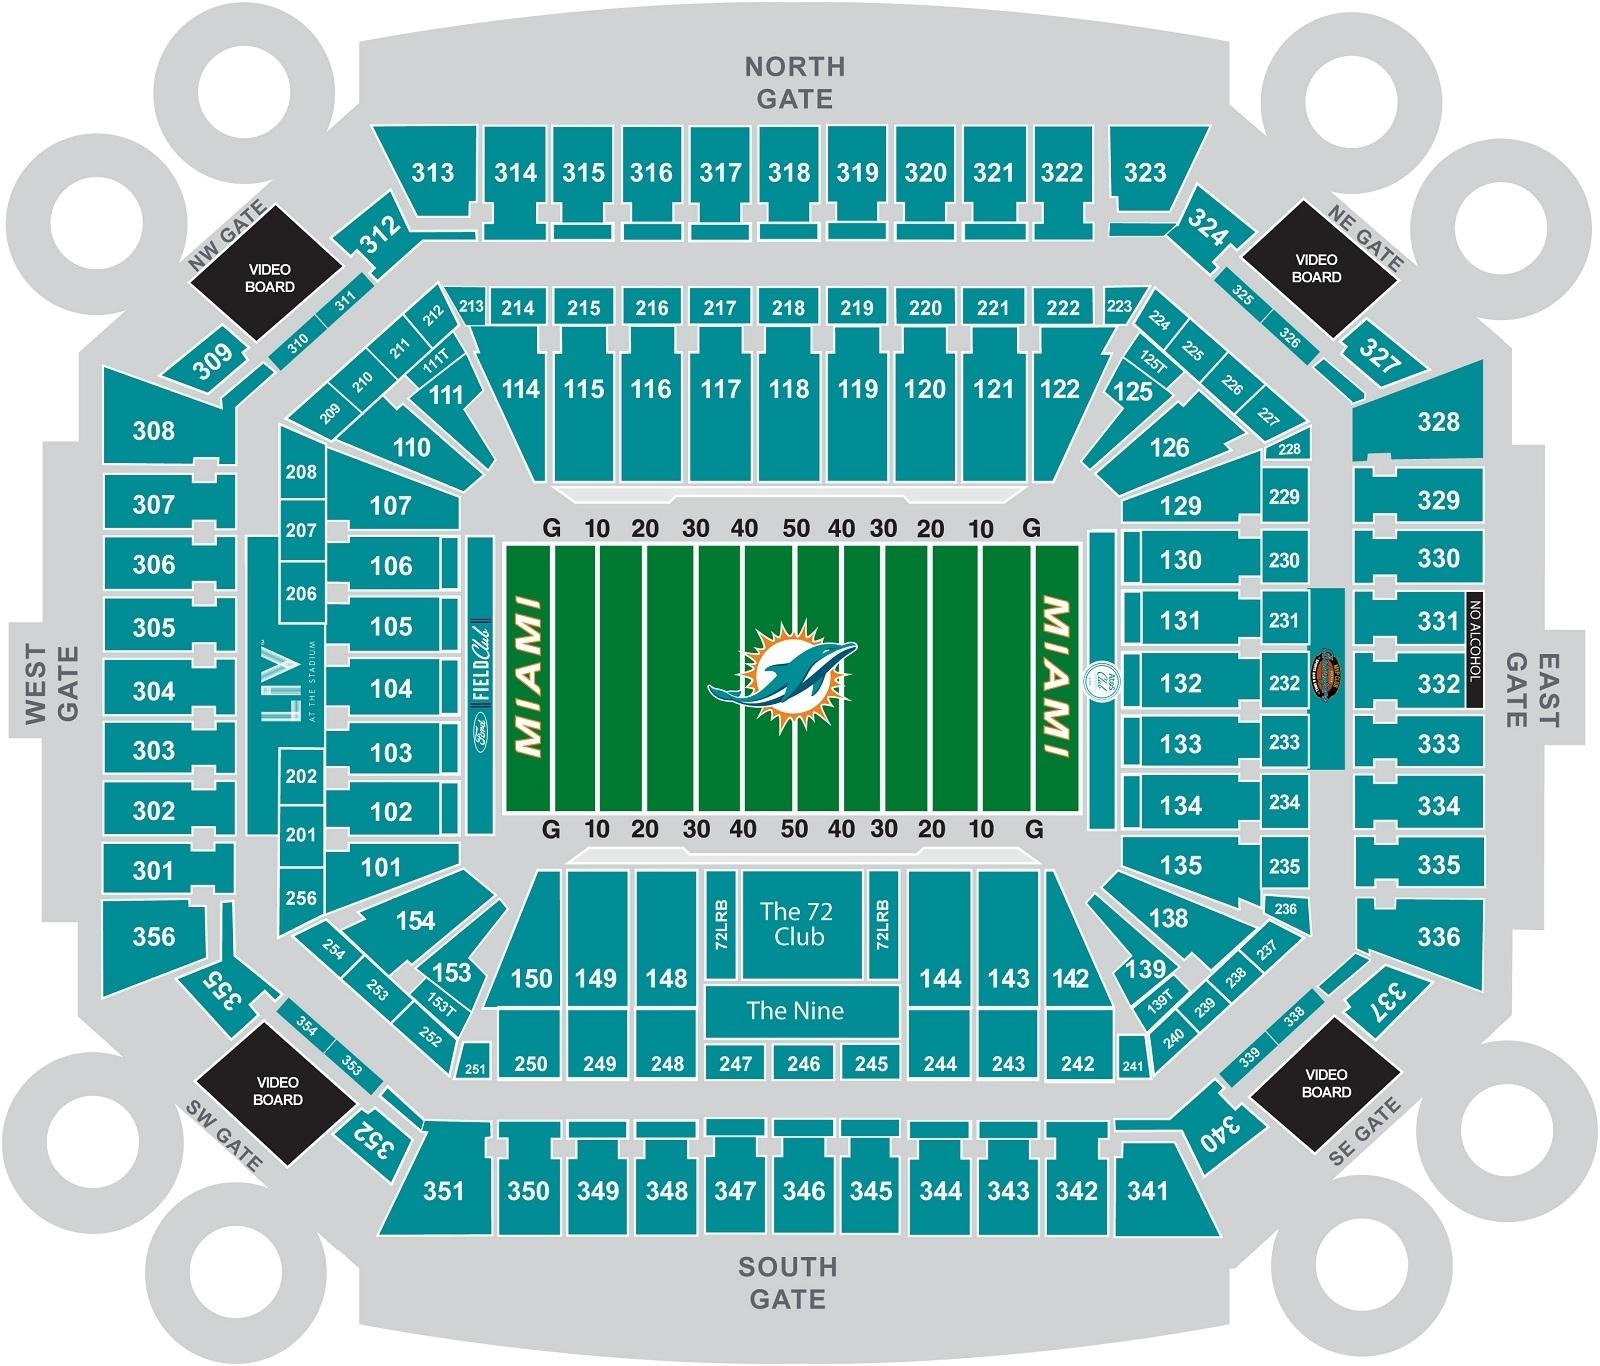 2020 Super Bowl Seating Chart | February 2, 2020 | Fan in Super Bowl Atlanta Seating